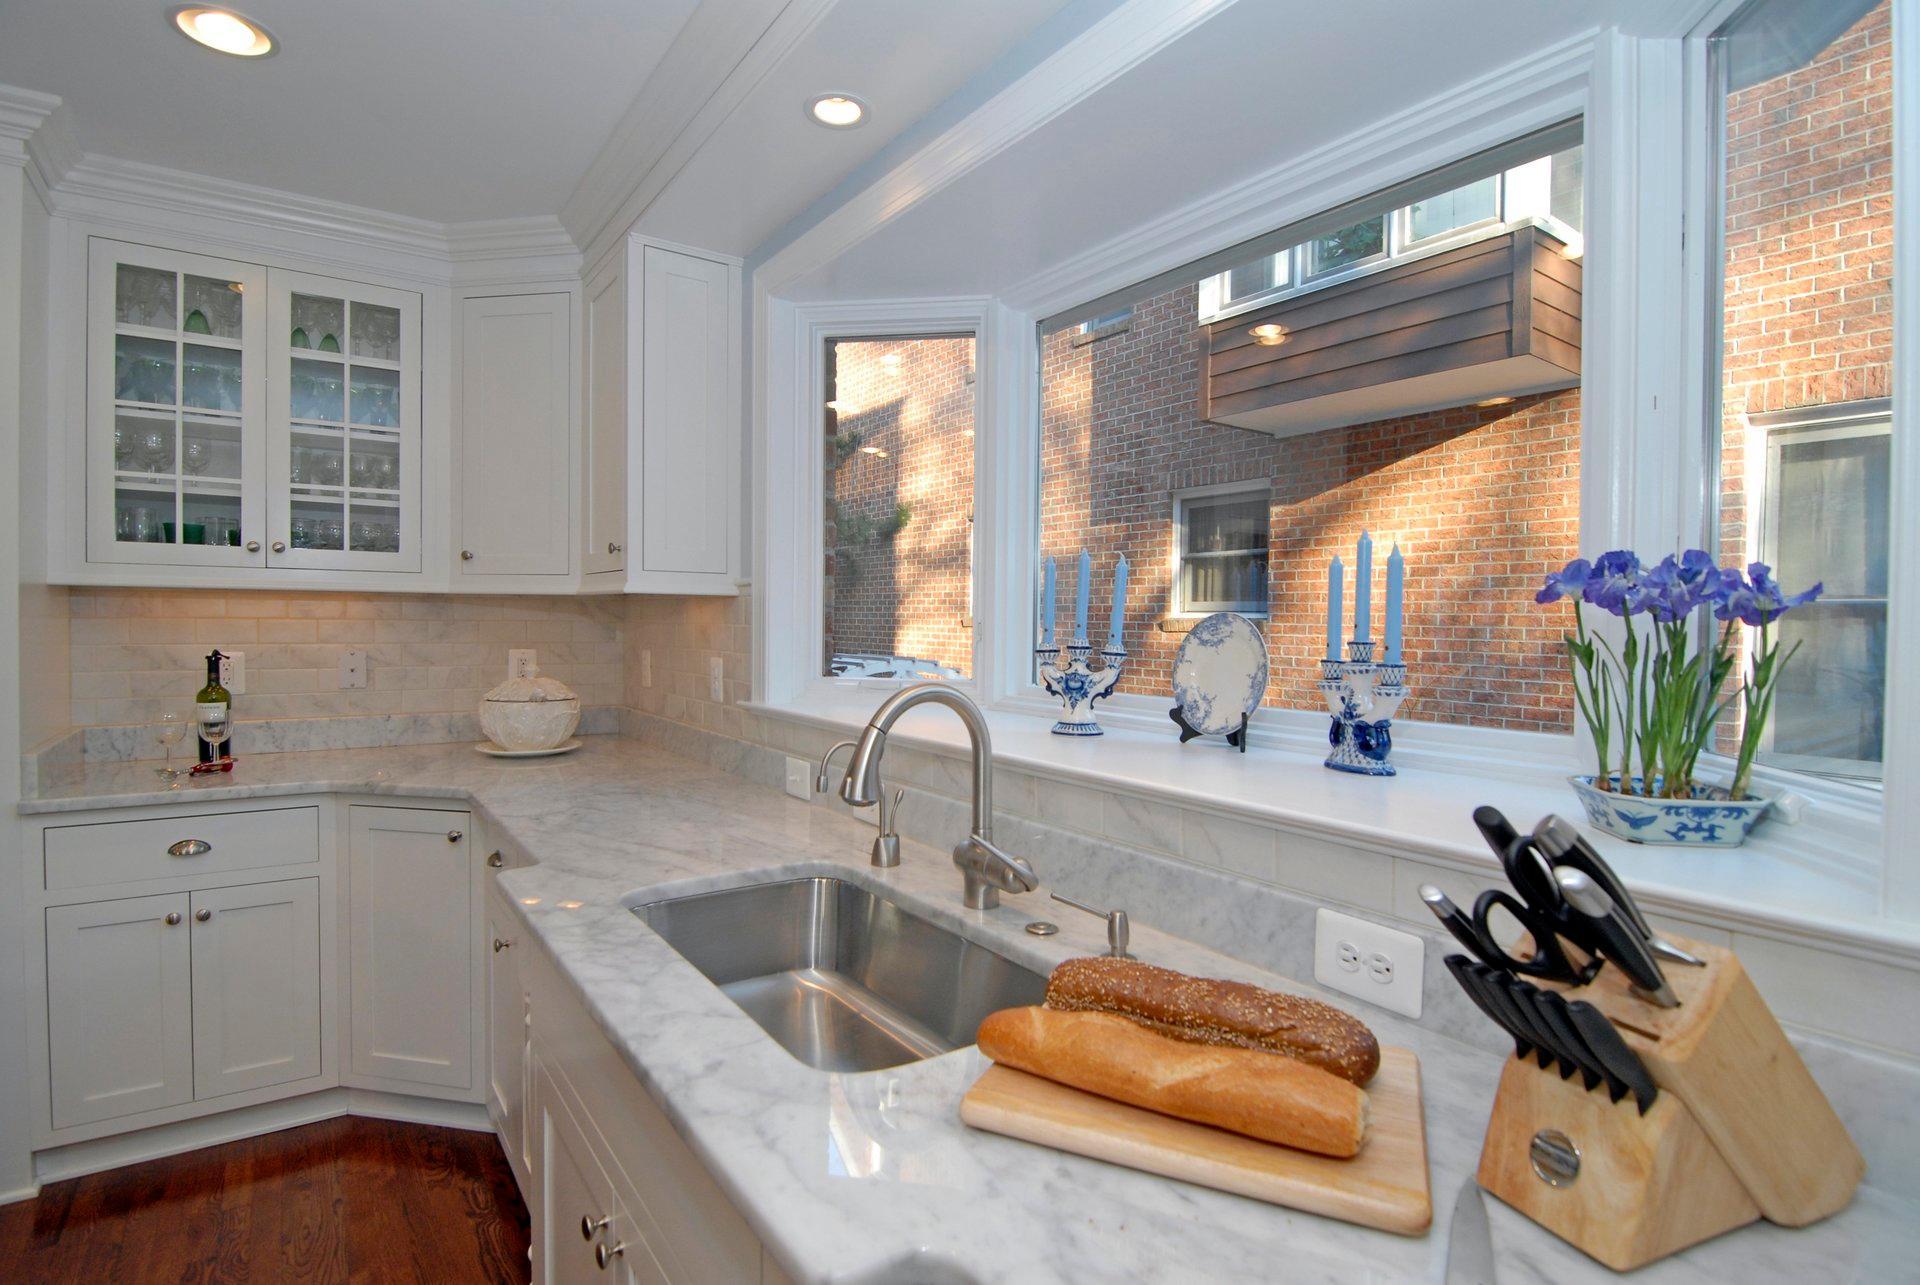 Terranova Construction Kitchen & Bath image 5